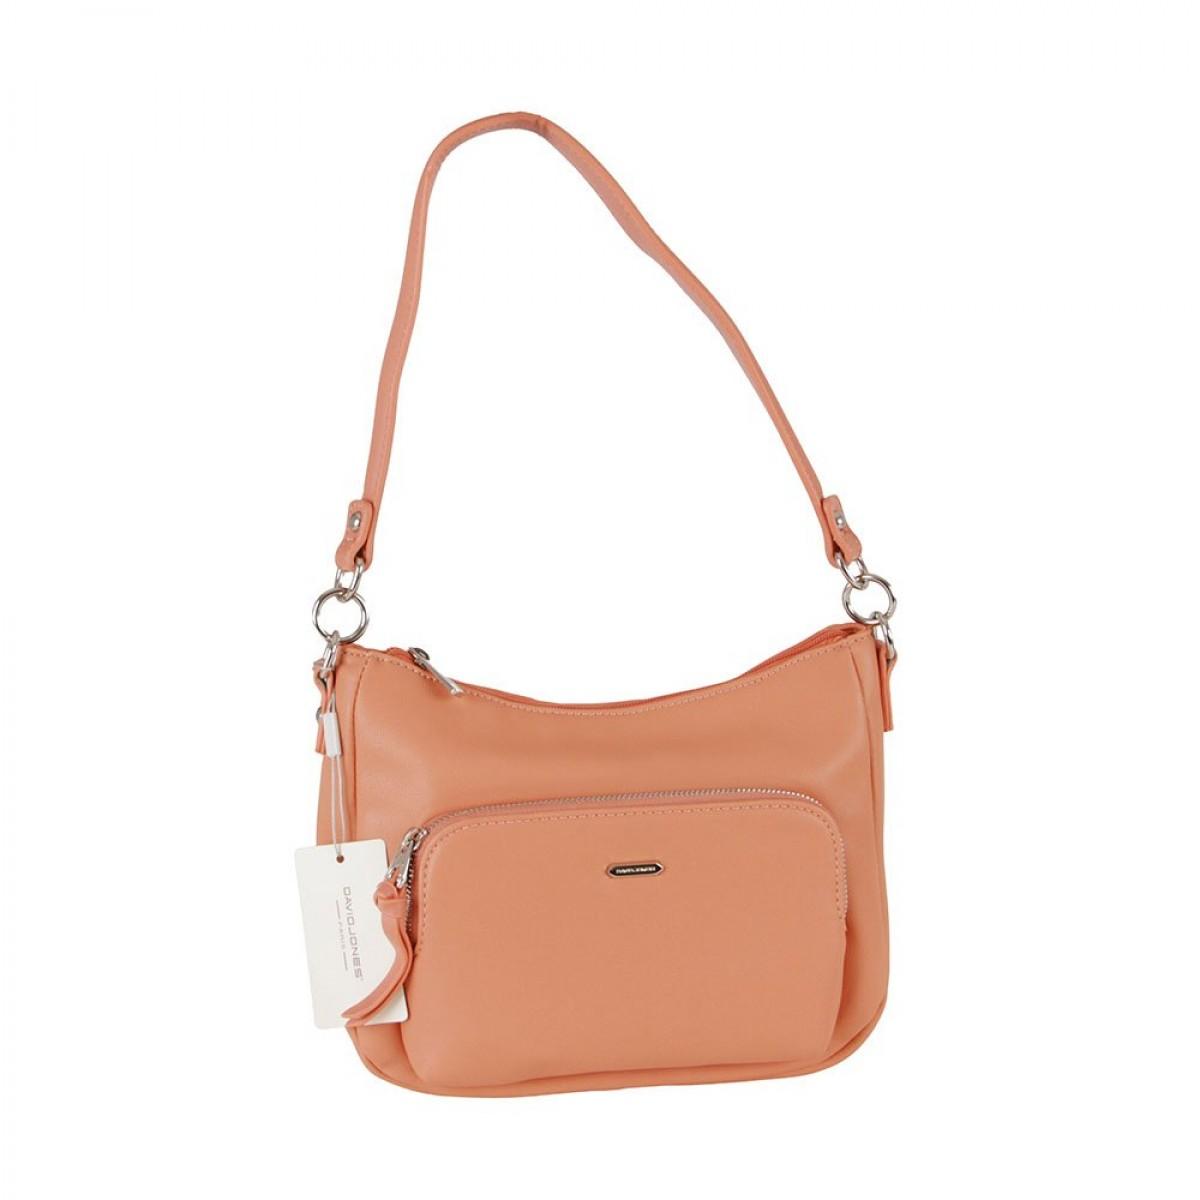 Жіноча сумка David Jones 6299-2 CORAL